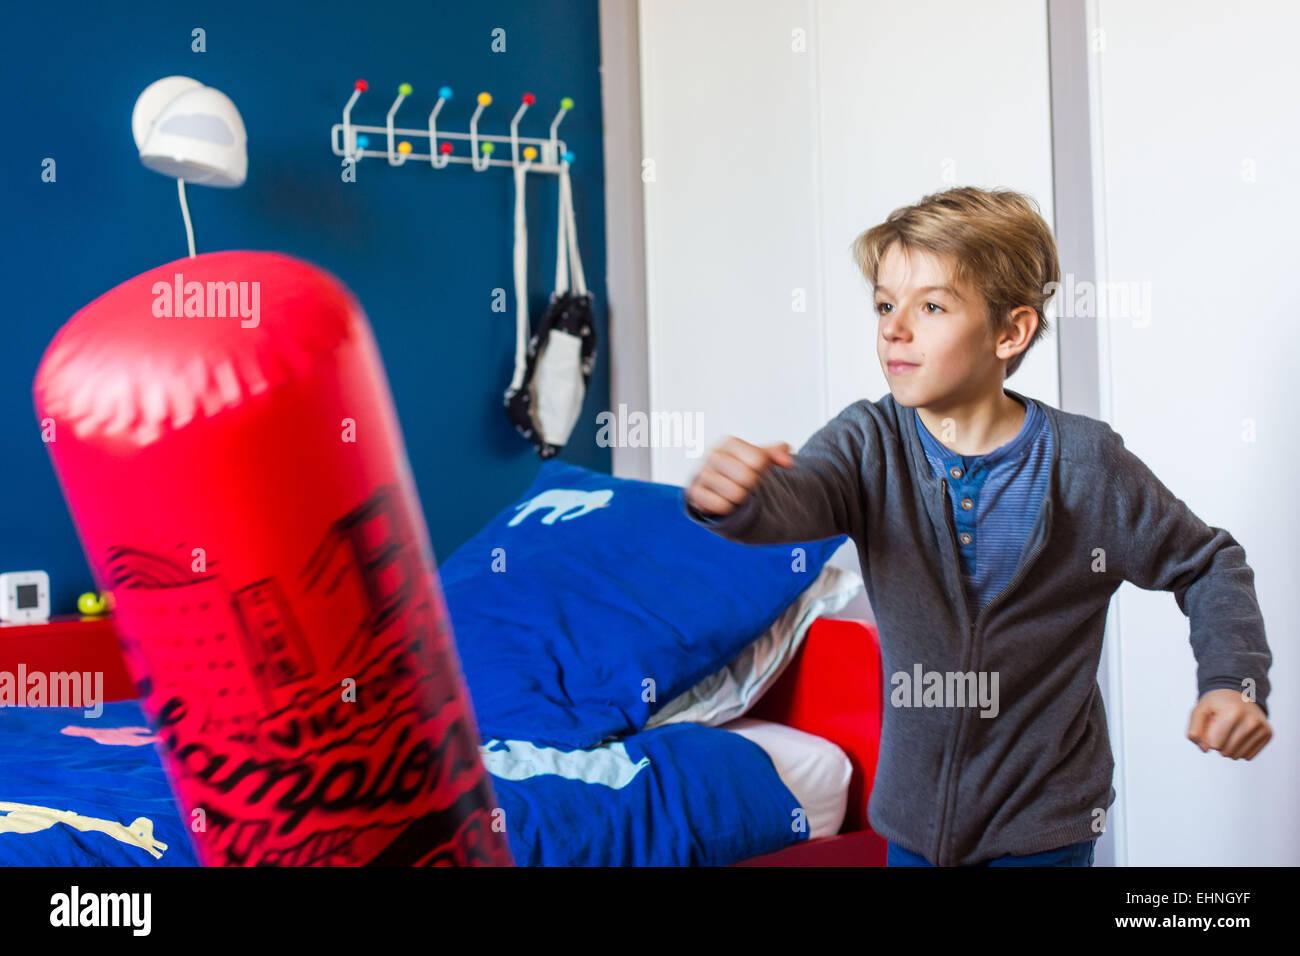 8 year old boy hitting a punching ball. - Stock Image